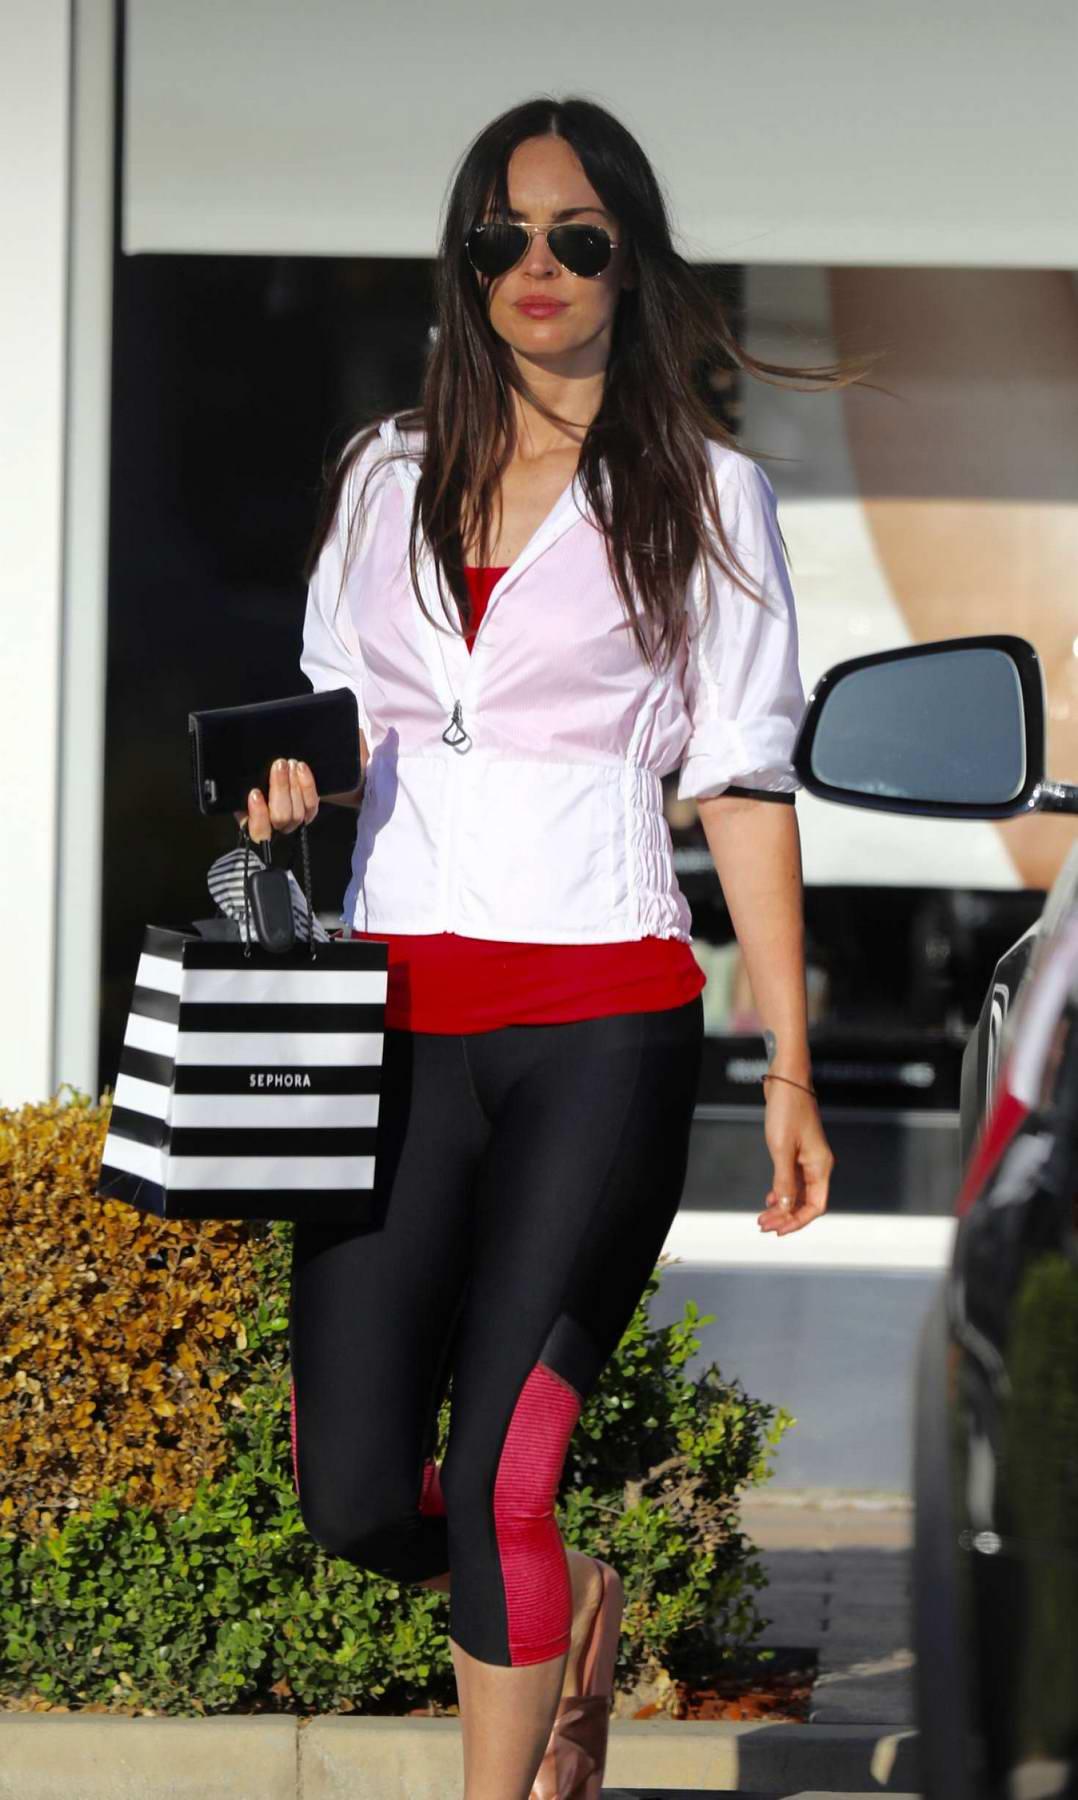 Megan Fox leaving a Cosmetic Store in Malibu